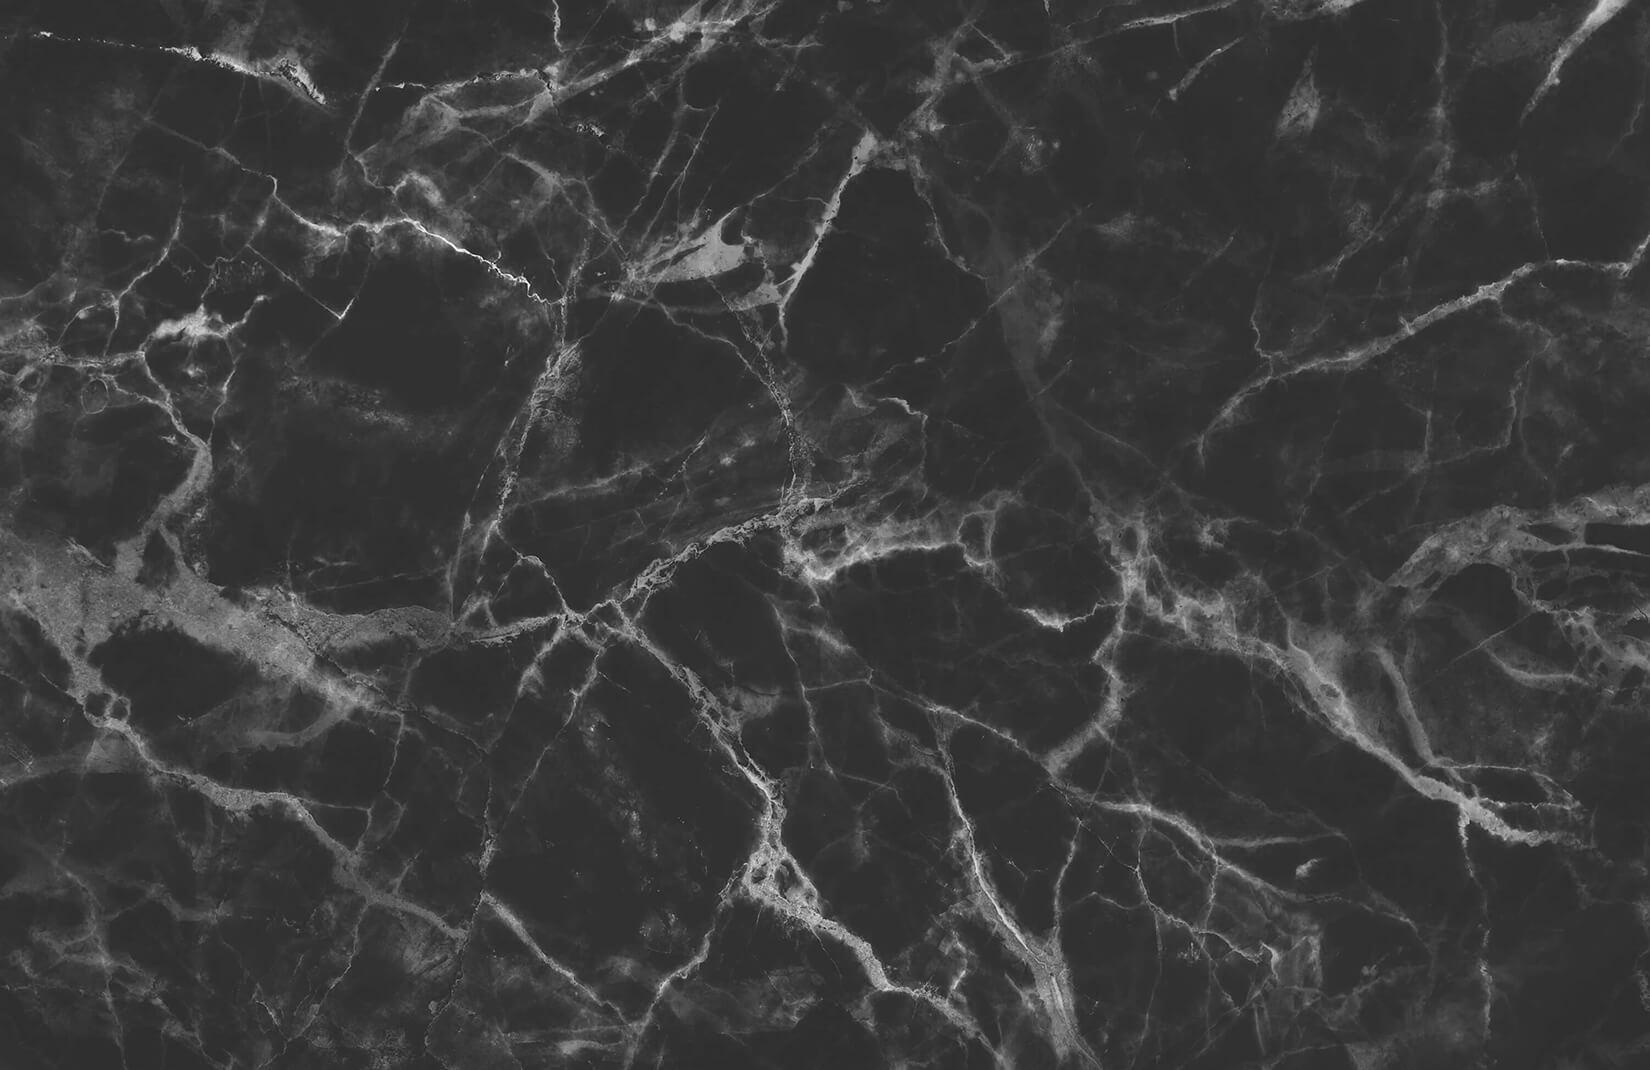 black-marble-textures-plain.jpg